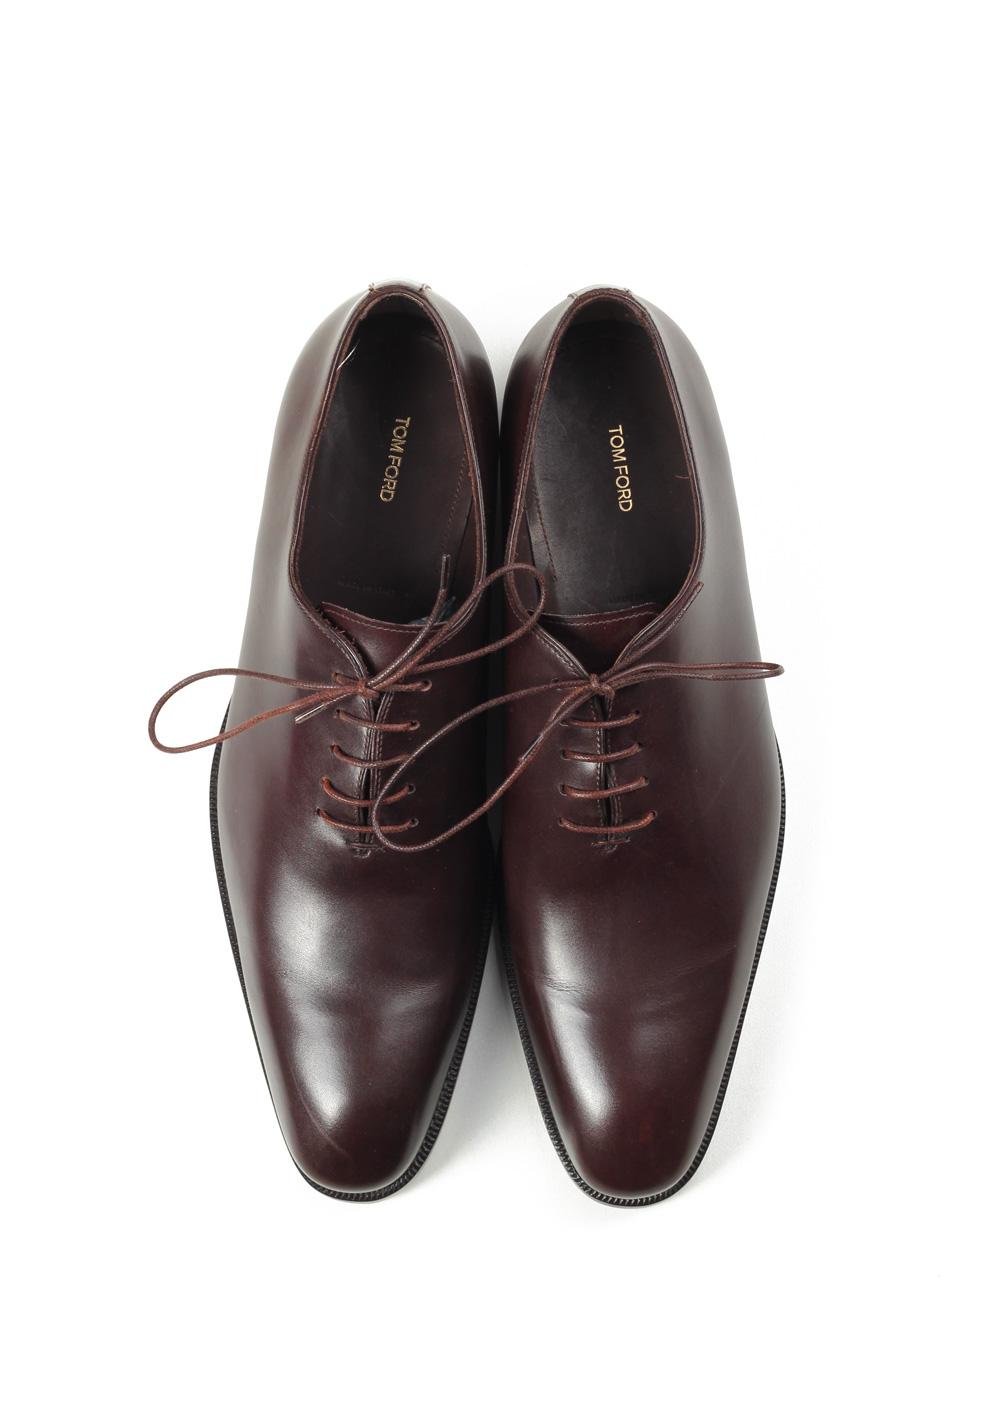 TOM FORD Gianni Whole-cut Oxford Shoes Size 8.5T Uk / 9.5T U.S. | Costume Limité